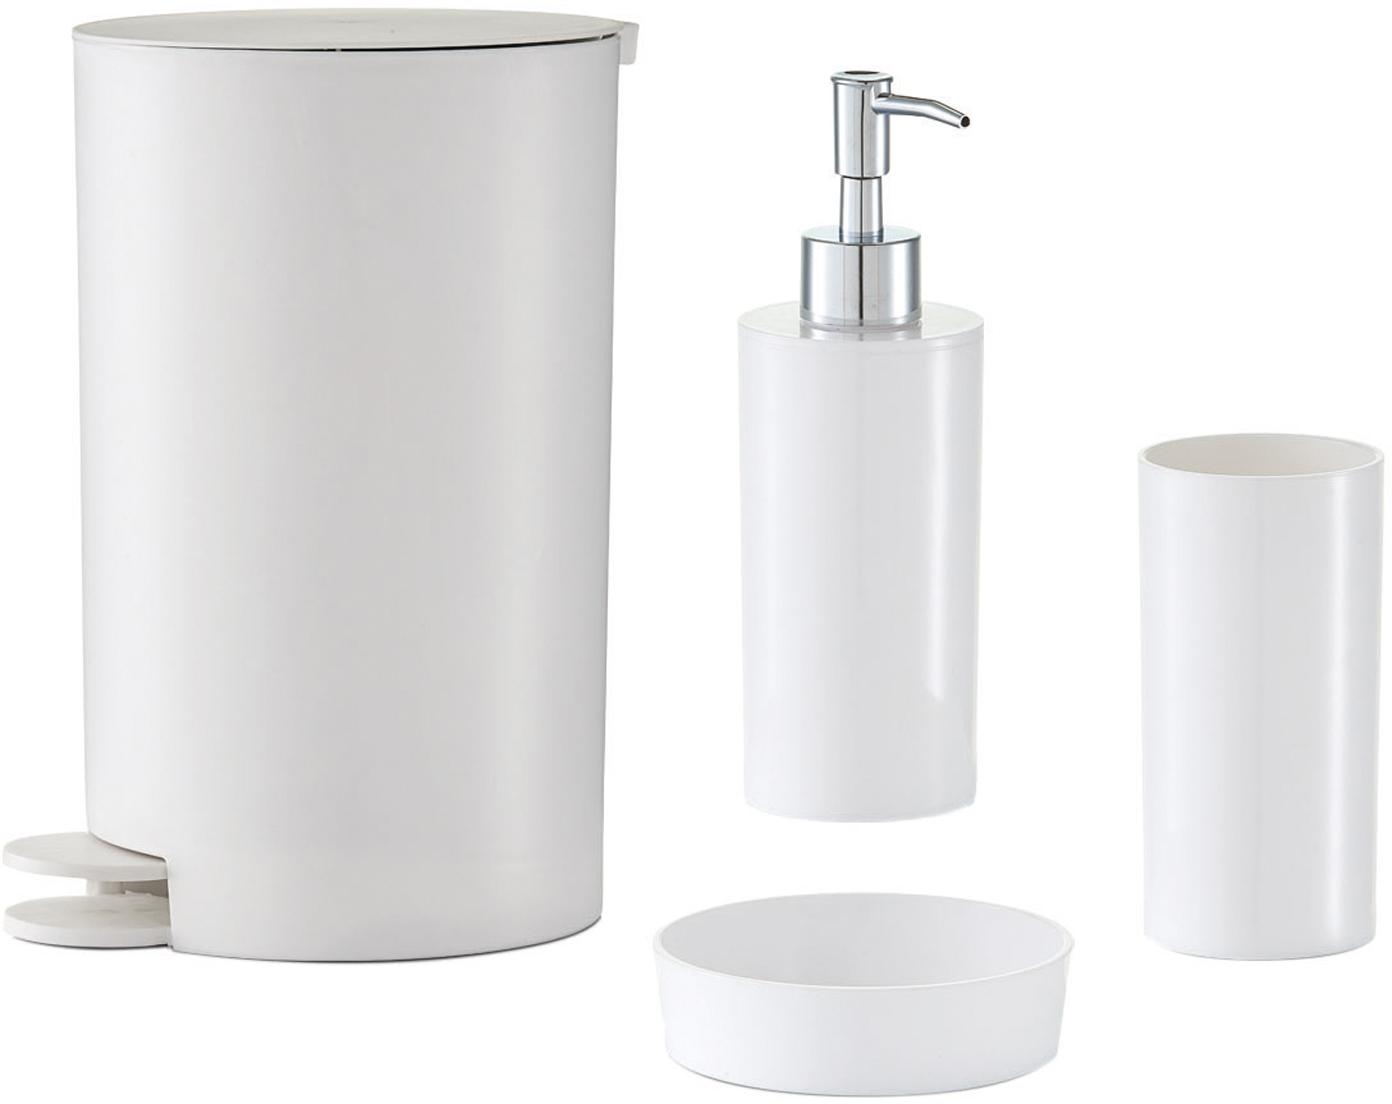 Set 4 accessori da bagno Nika, Materiale sintetico, Bianco, Set in varie misure